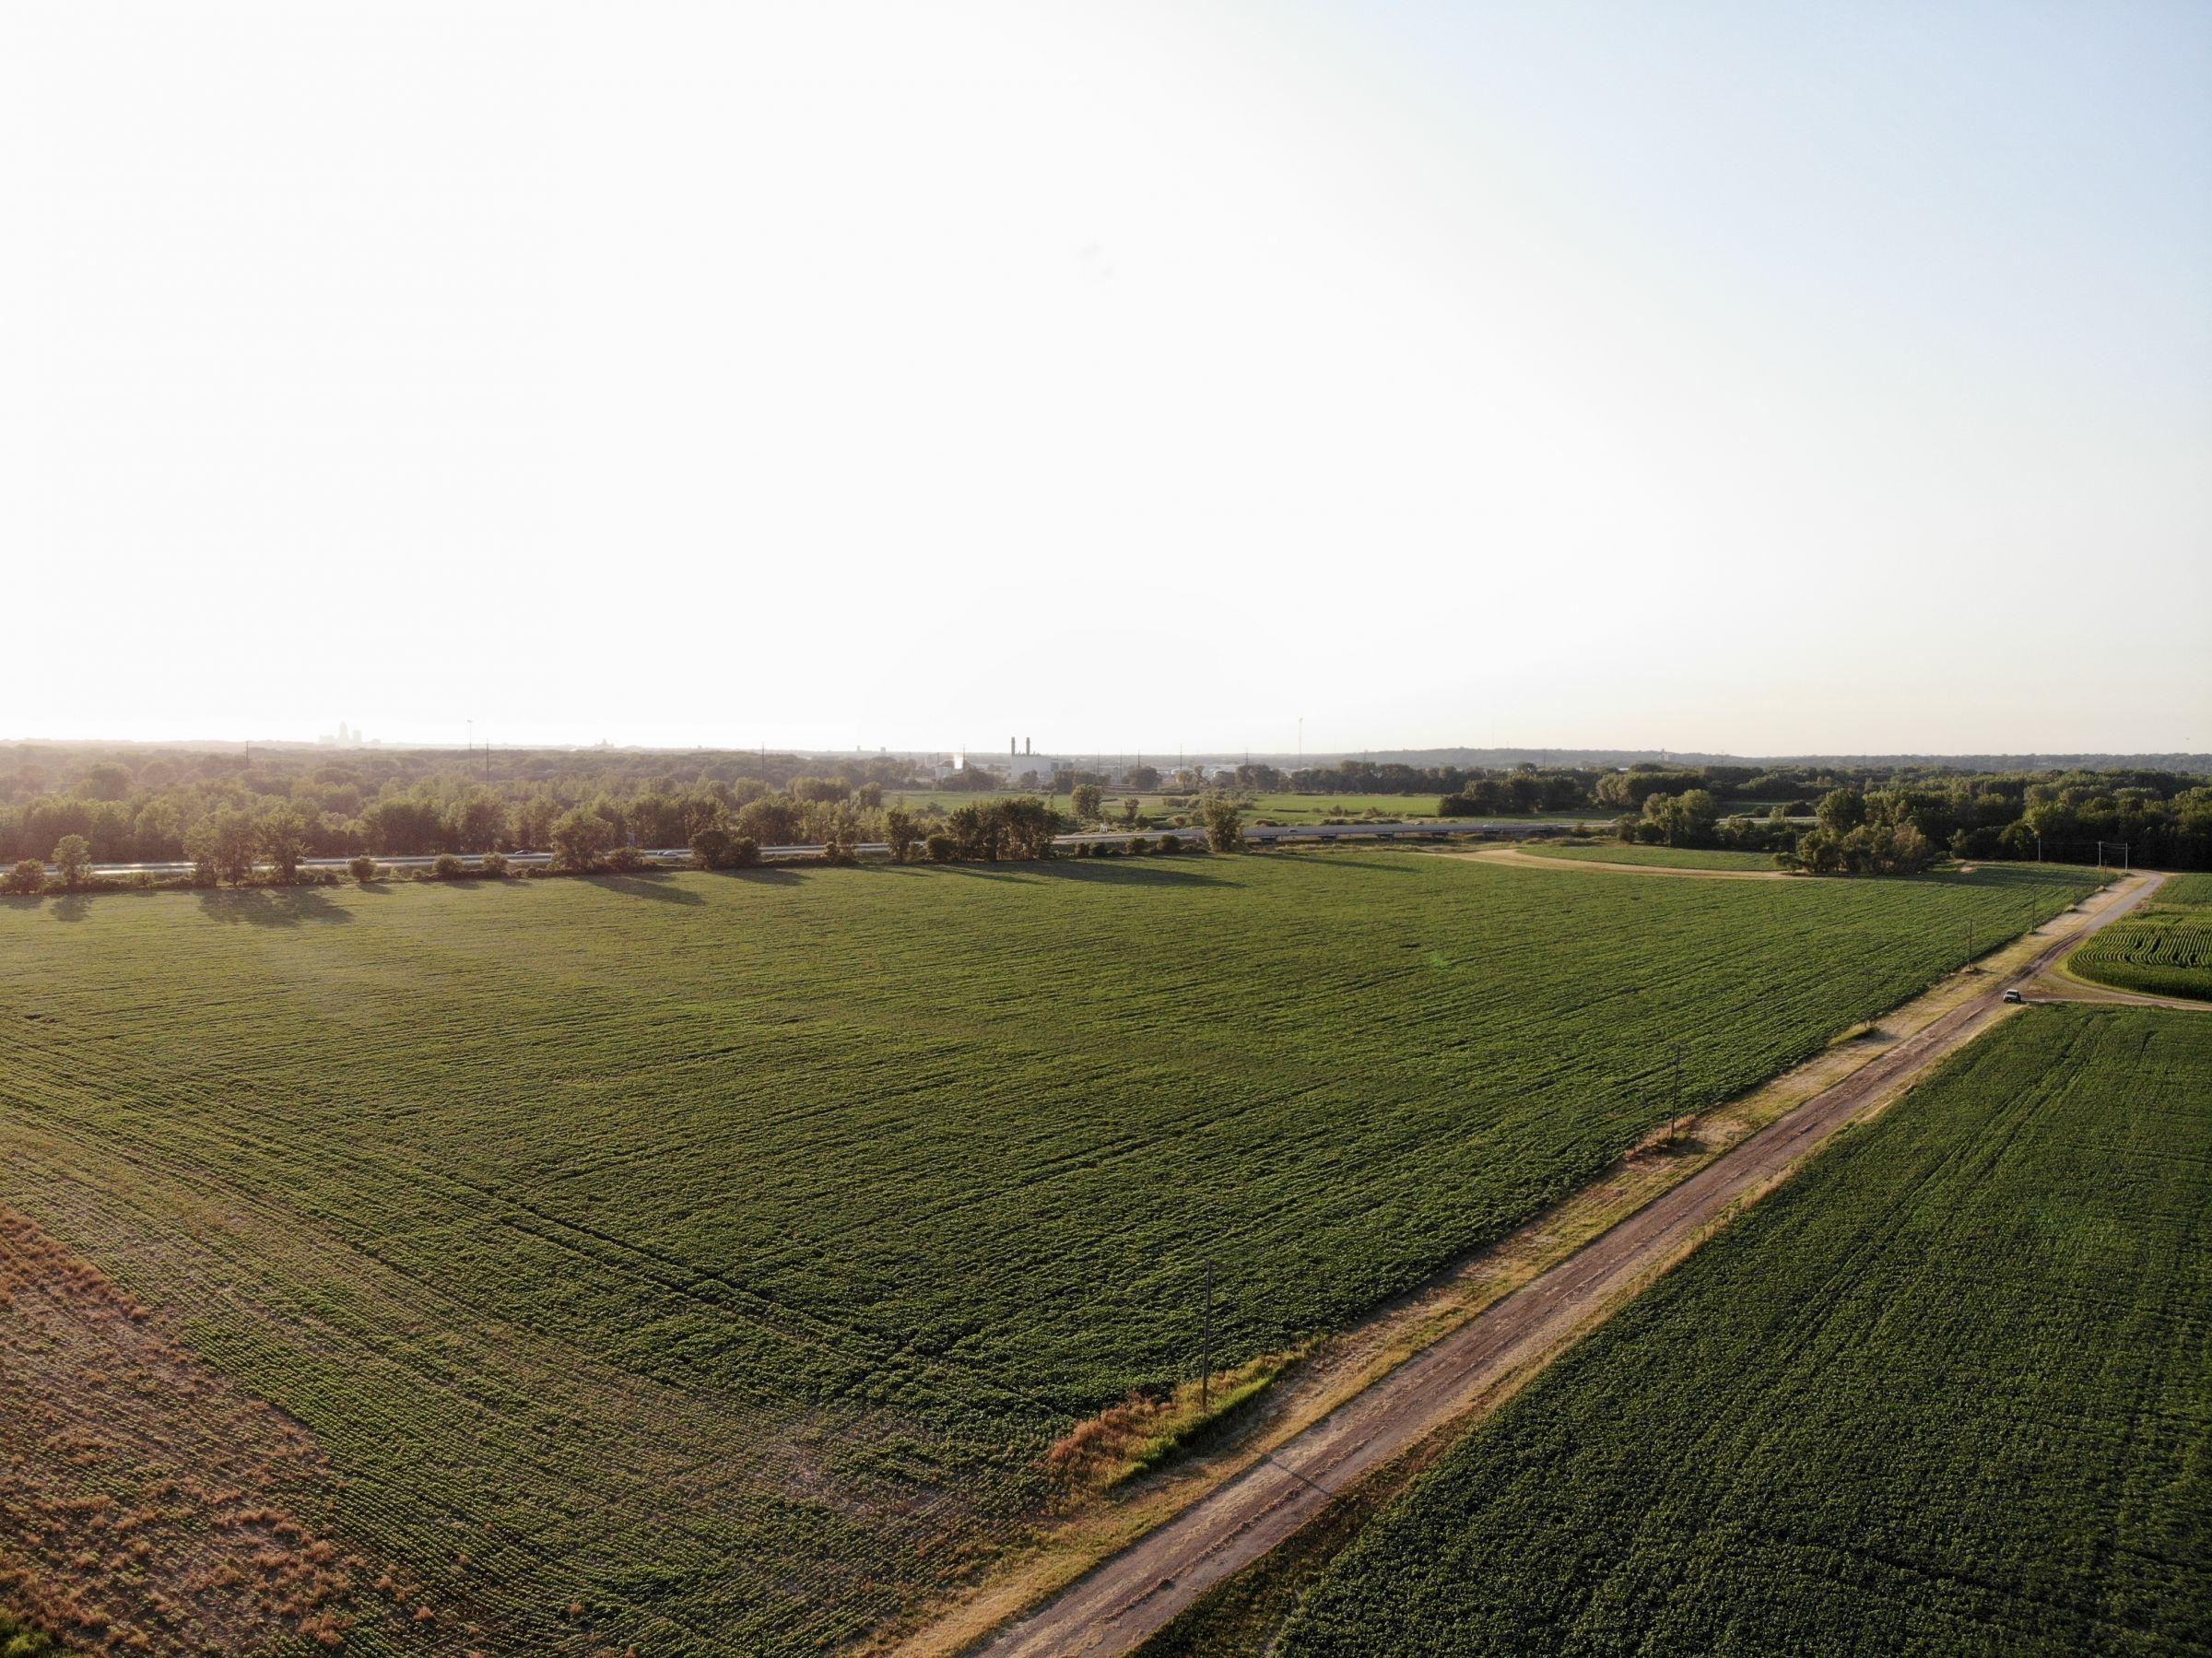 land-polk-county-iowa-89-acres-listing-number-15626-8-2021-07-09-142619.jpg